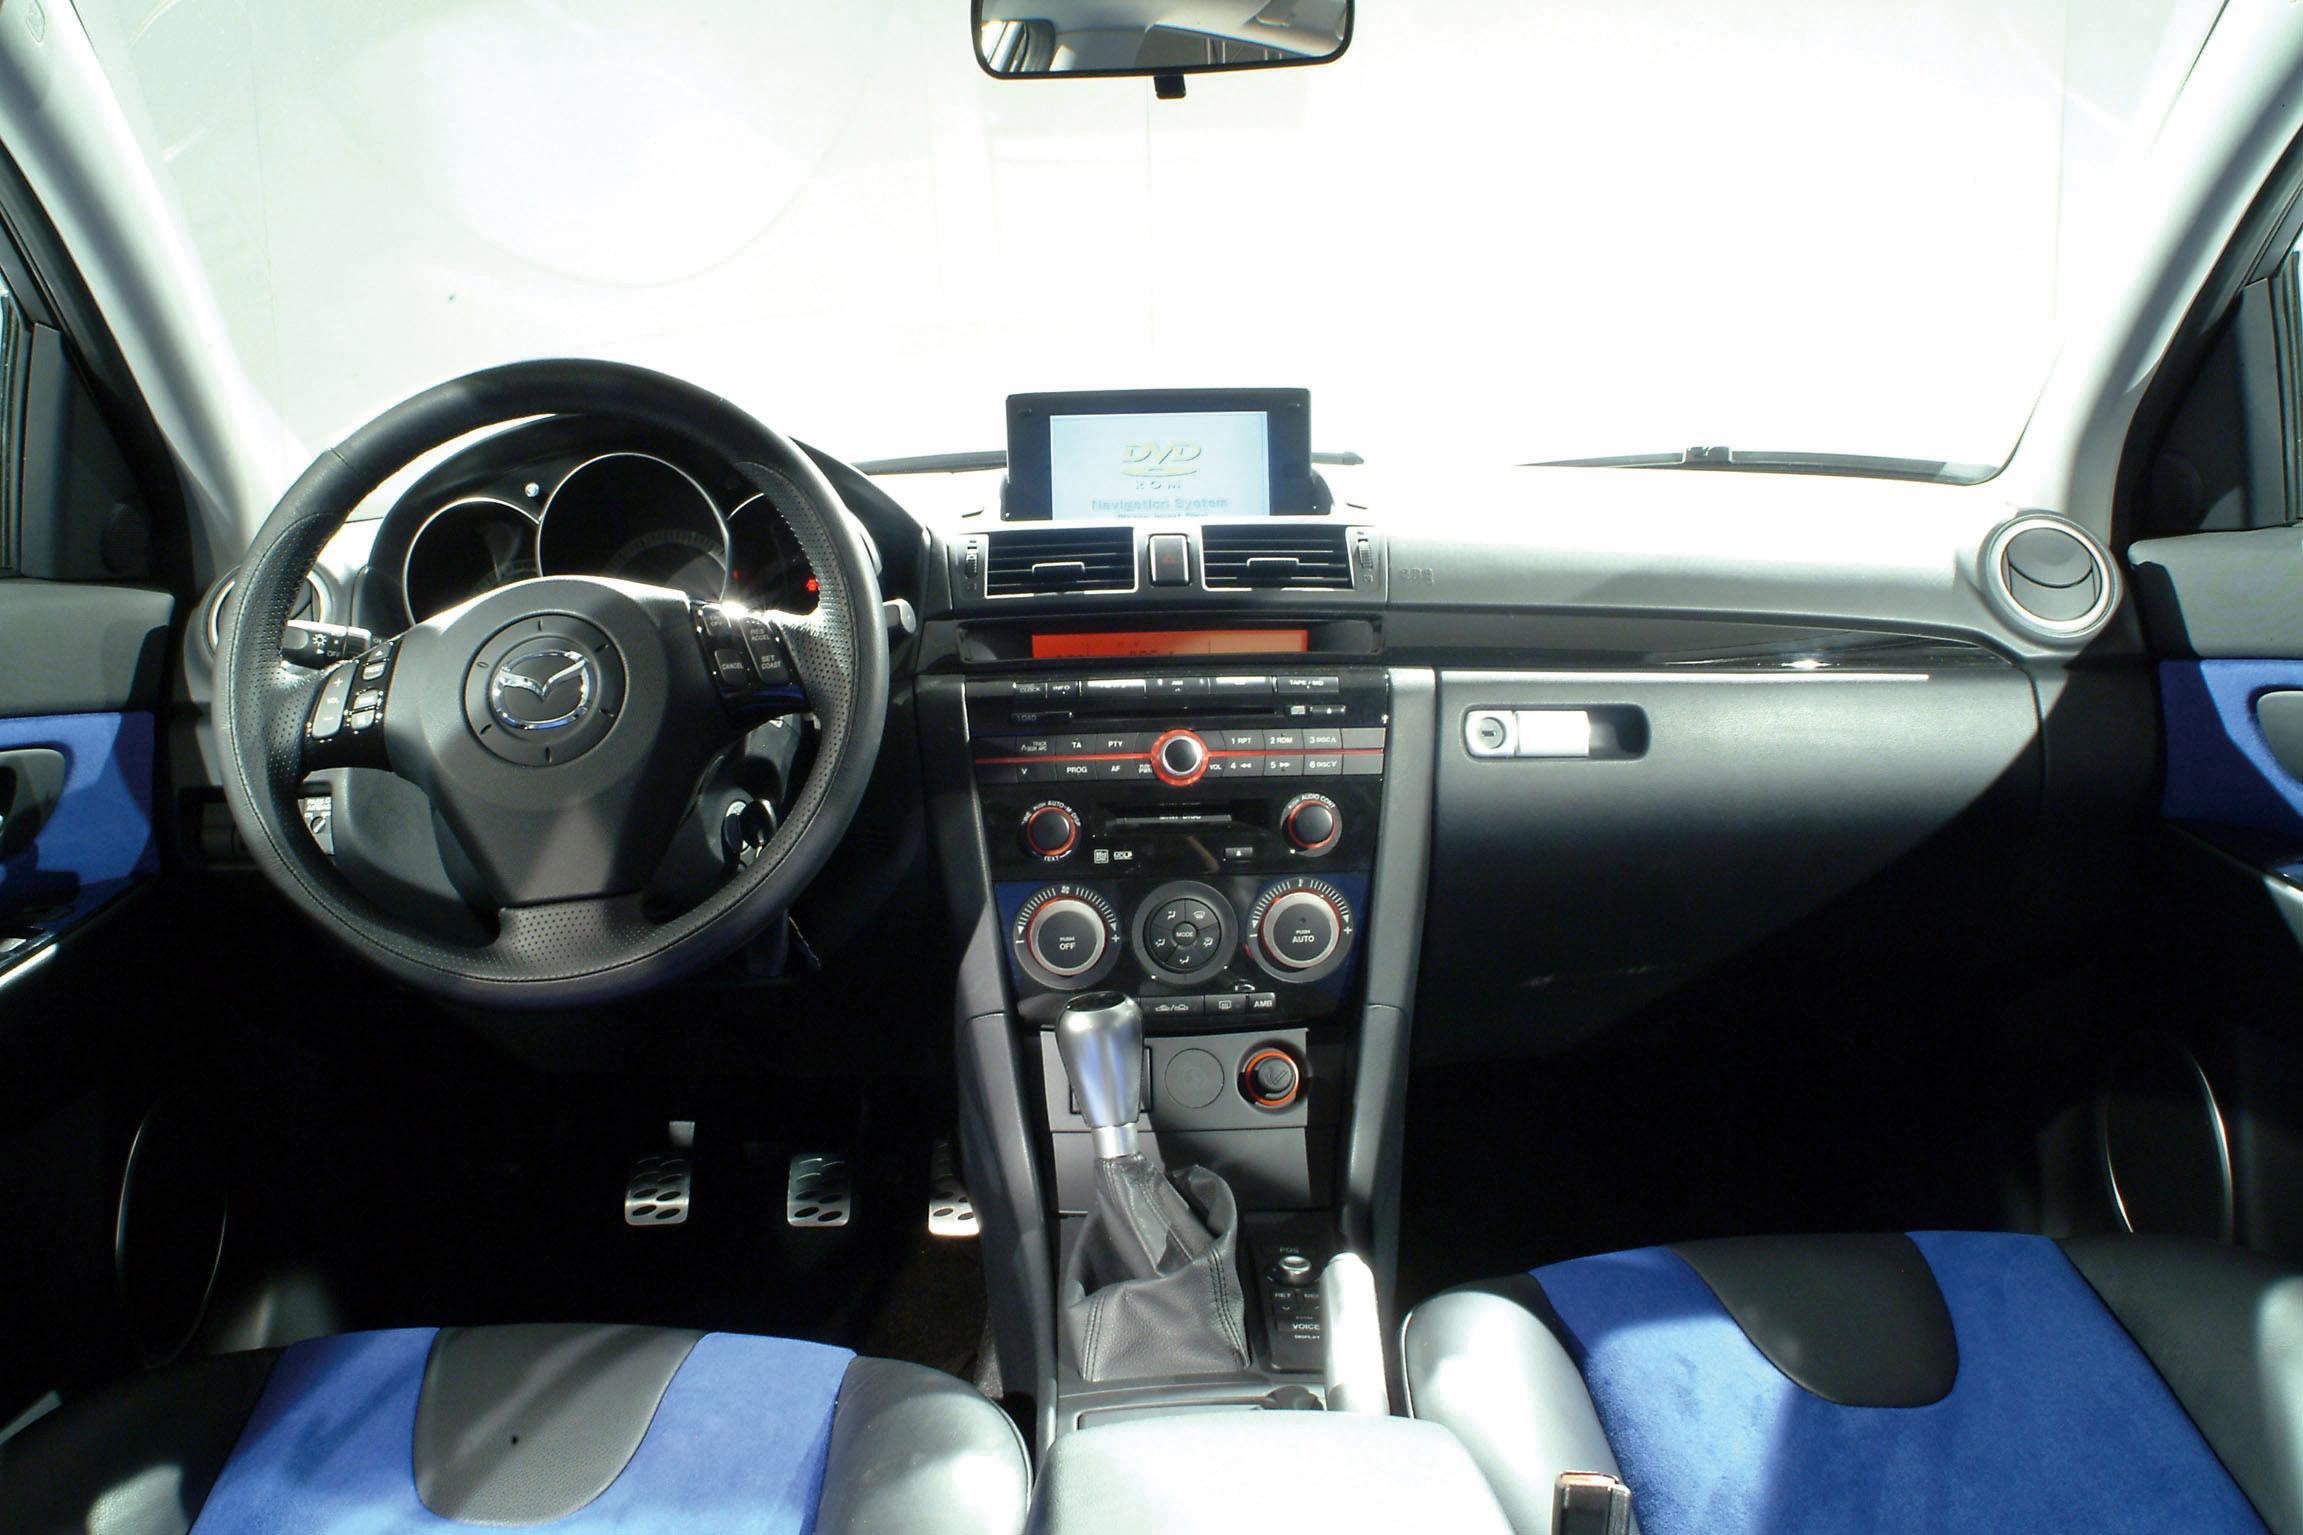 https://www.automobilesreview.com/gallery/2003-mazda-mx-sportif-concept/2003-mazda-mx-sportif-concept-51.jpg